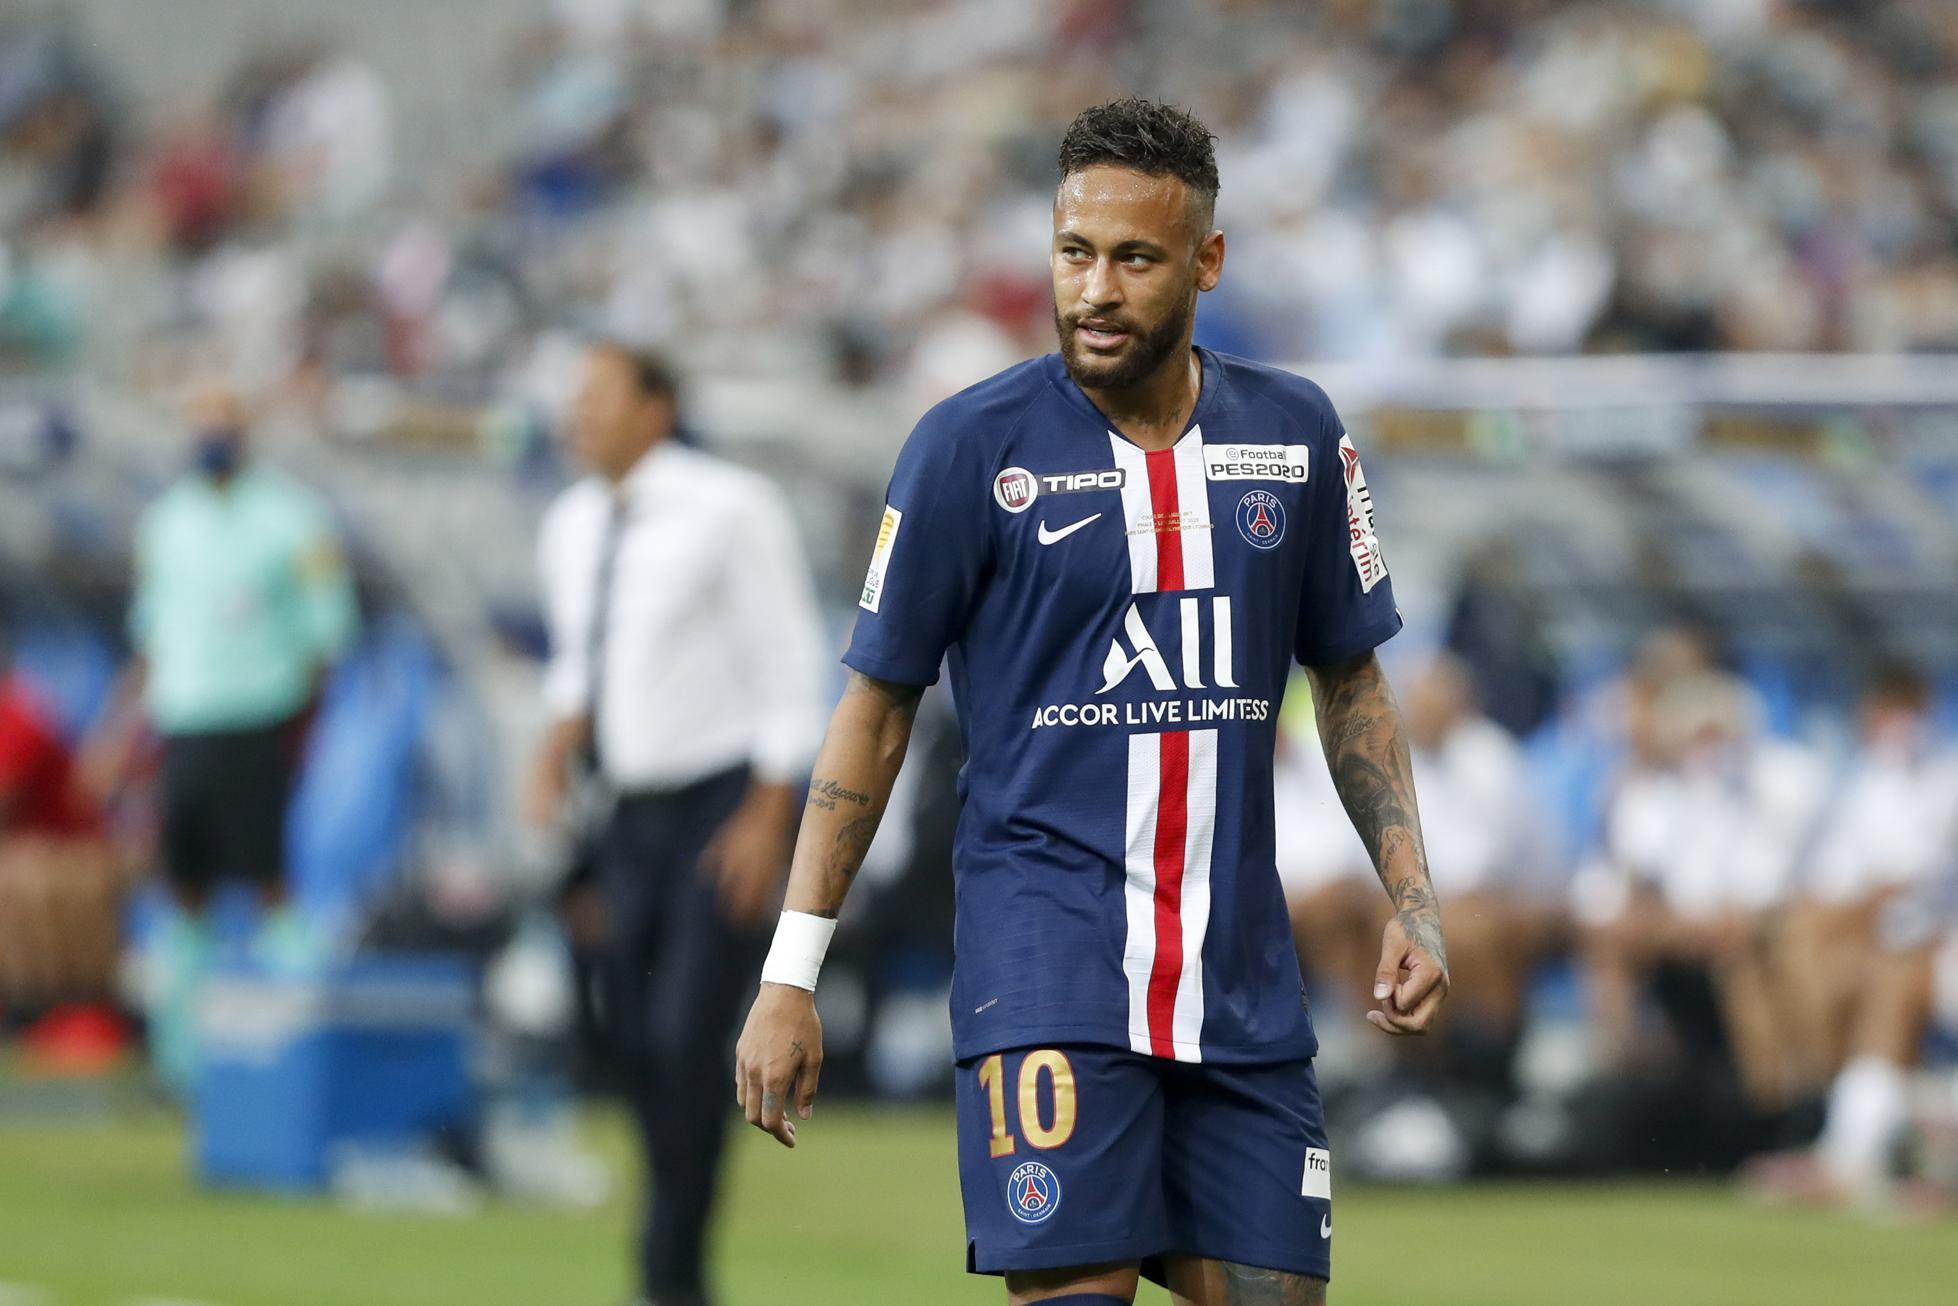 Neymar staring down the pitch.